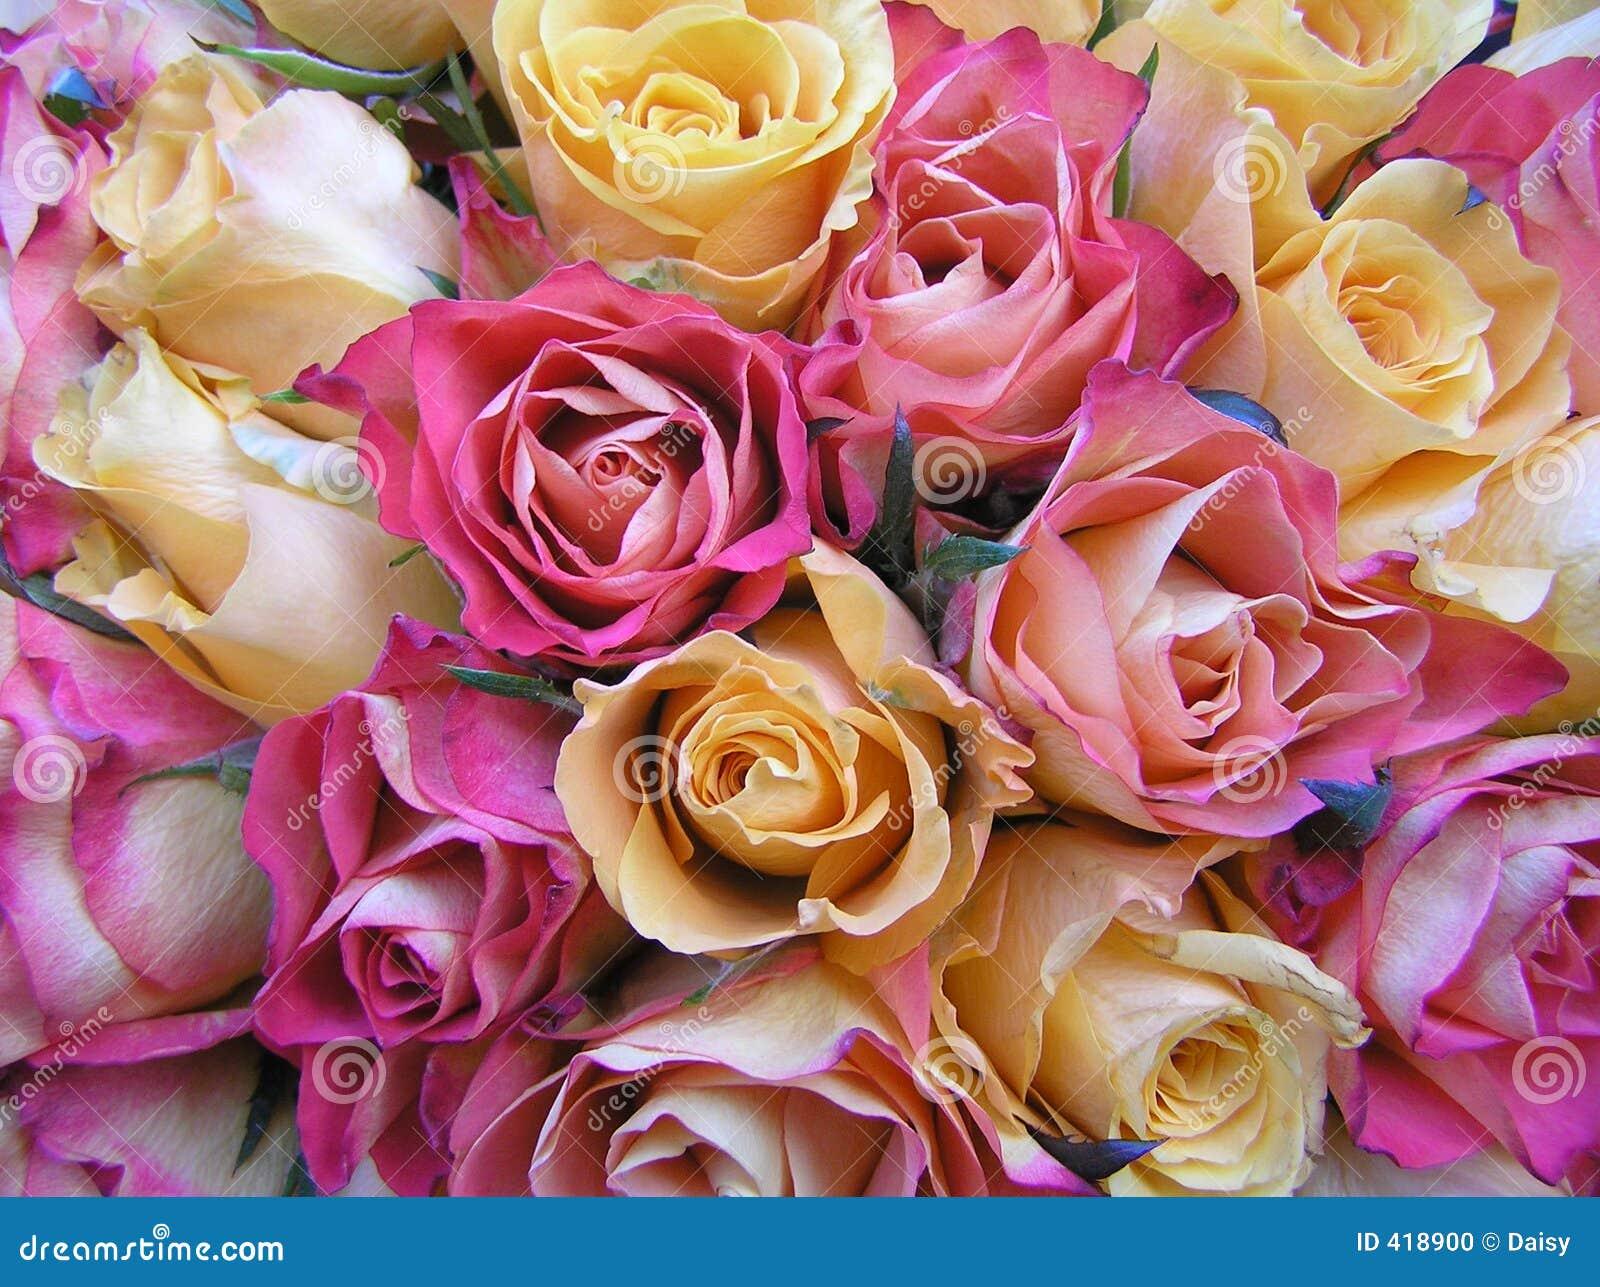 pastel wedding bouquet stock photo image 418900. Black Bedroom Furniture Sets. Home Design Ideas